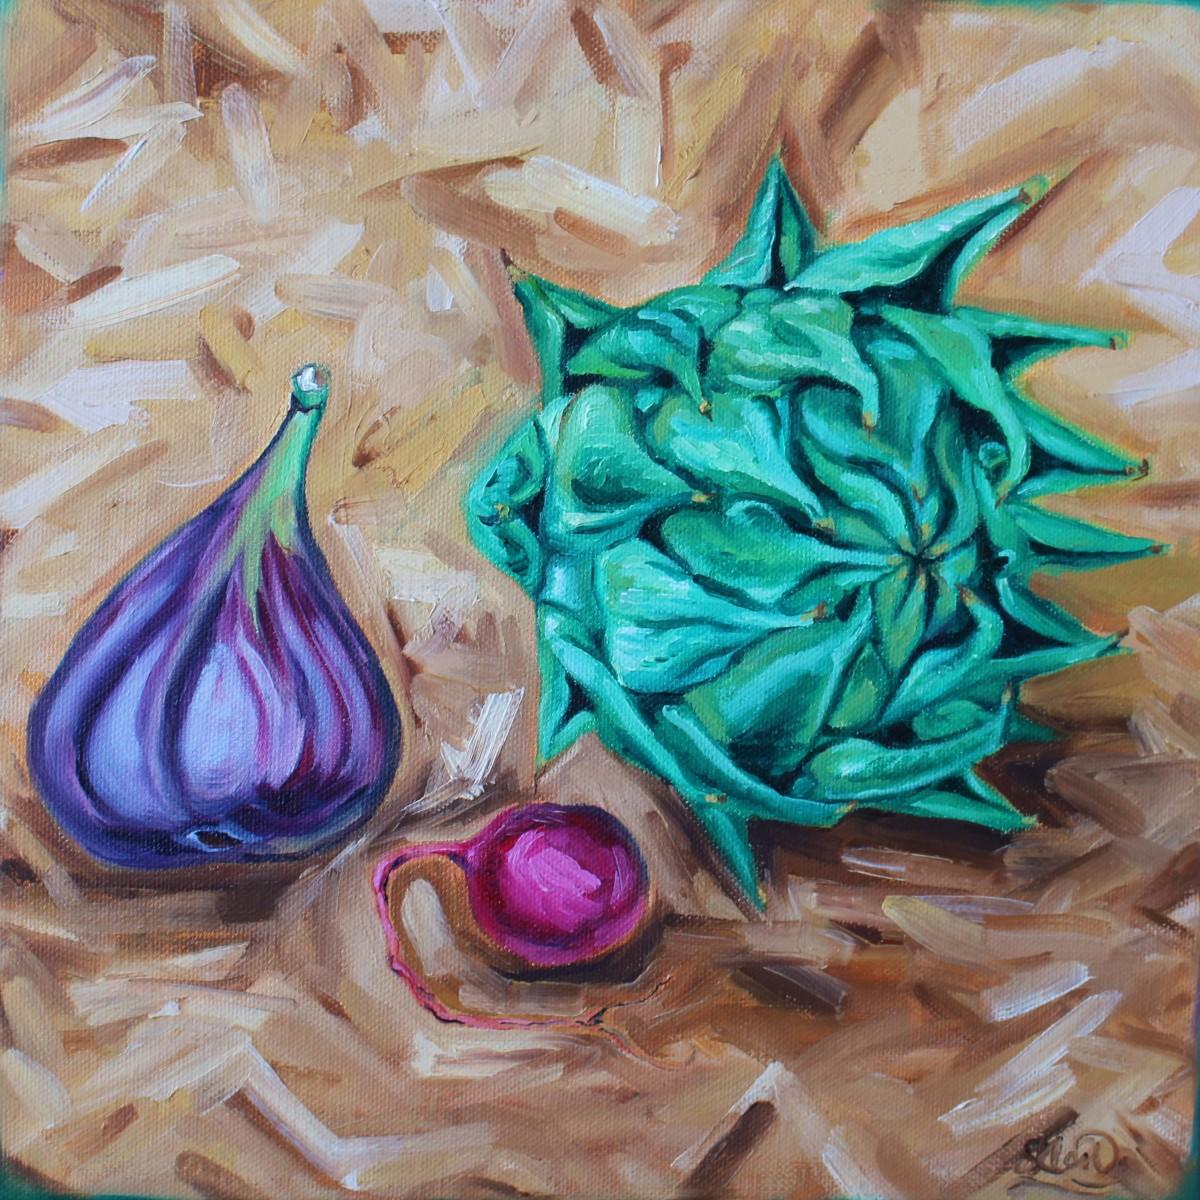 Artichoke, Fig, and Radish